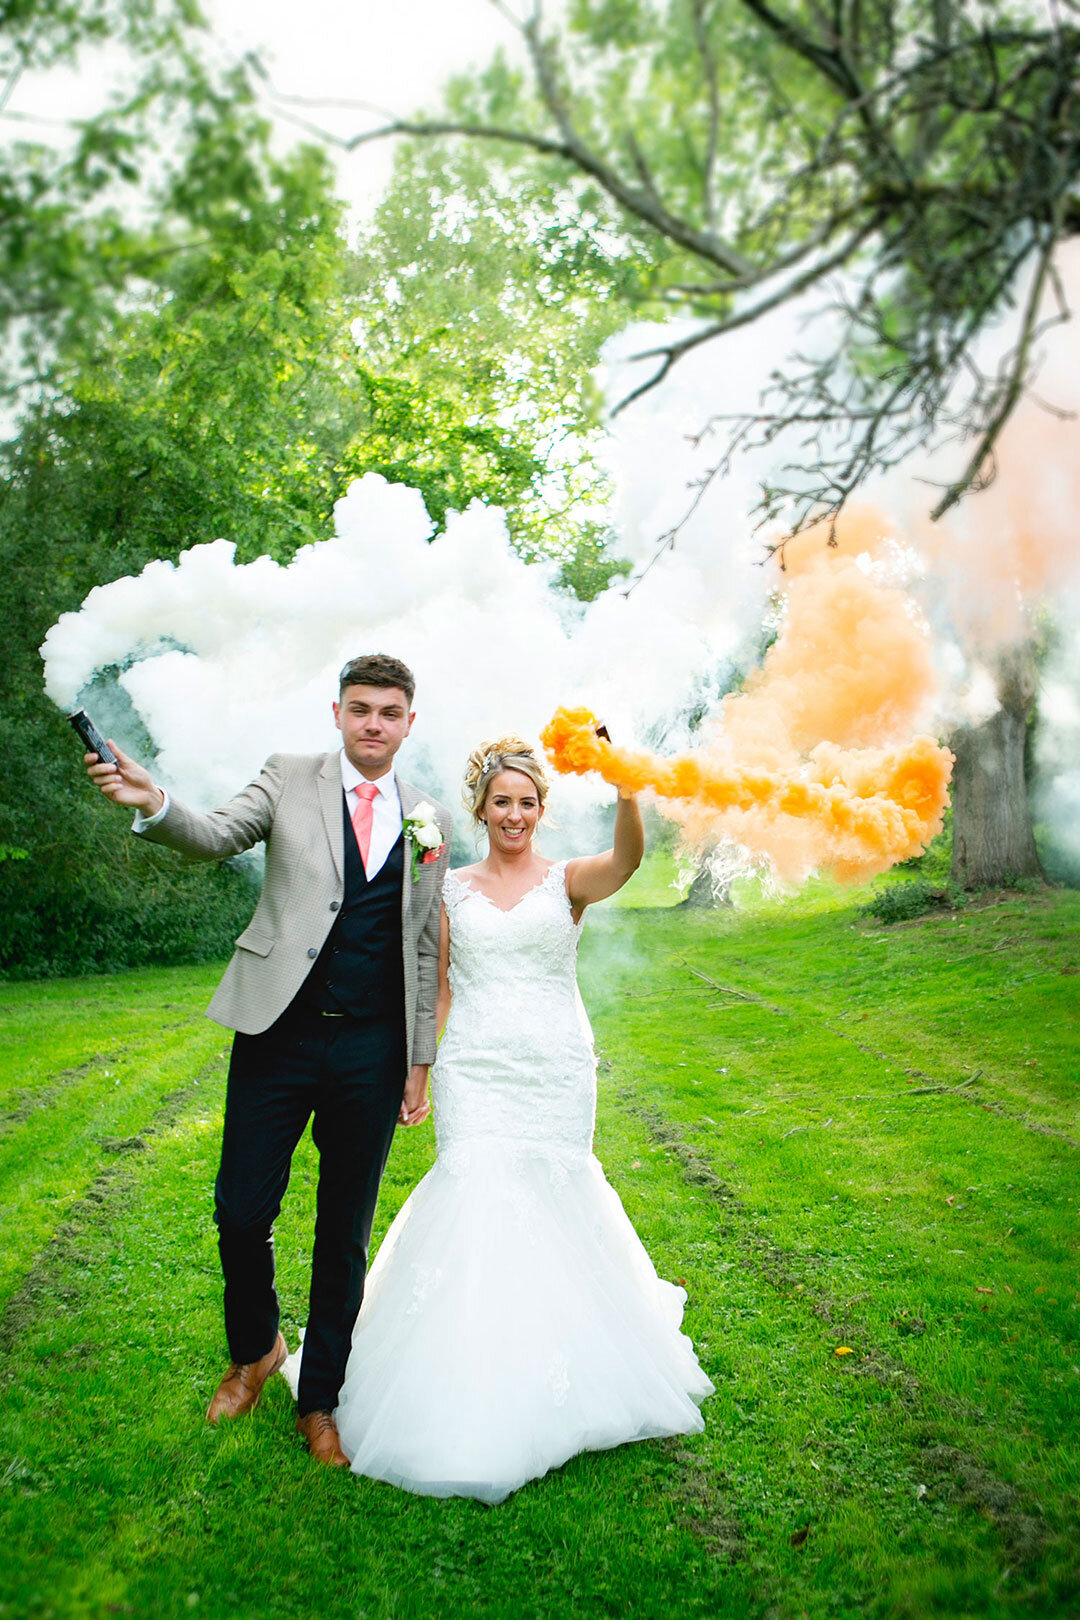 5 Fun Wedding Photography Ideas Engage Weddings